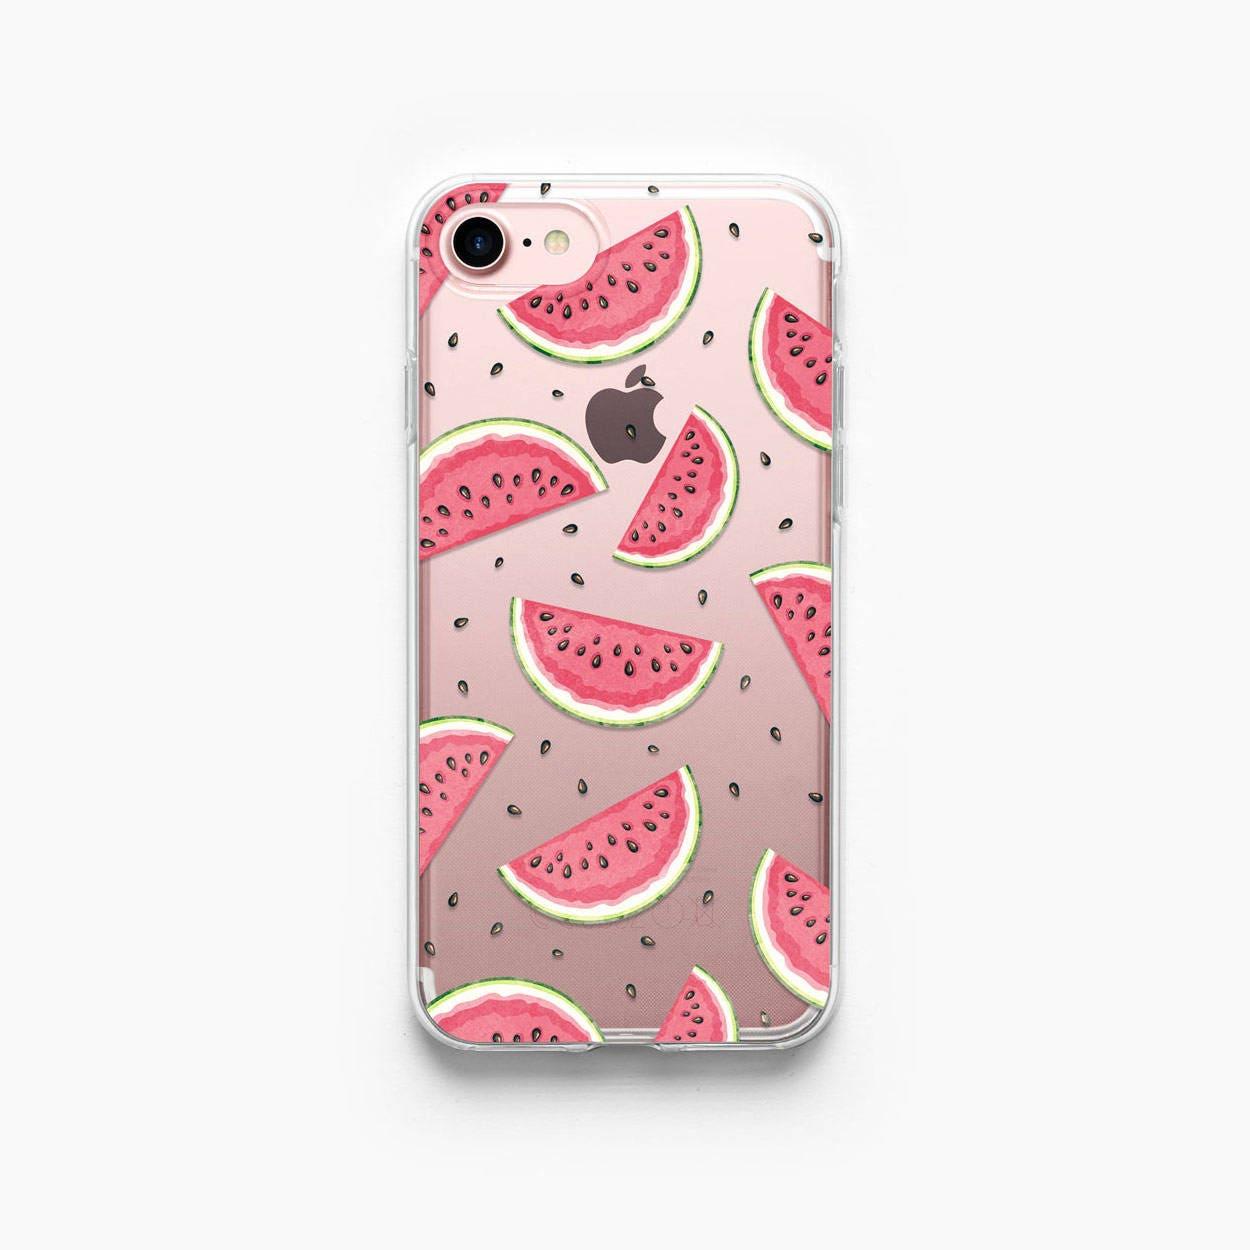 iphone 7 watermelon case